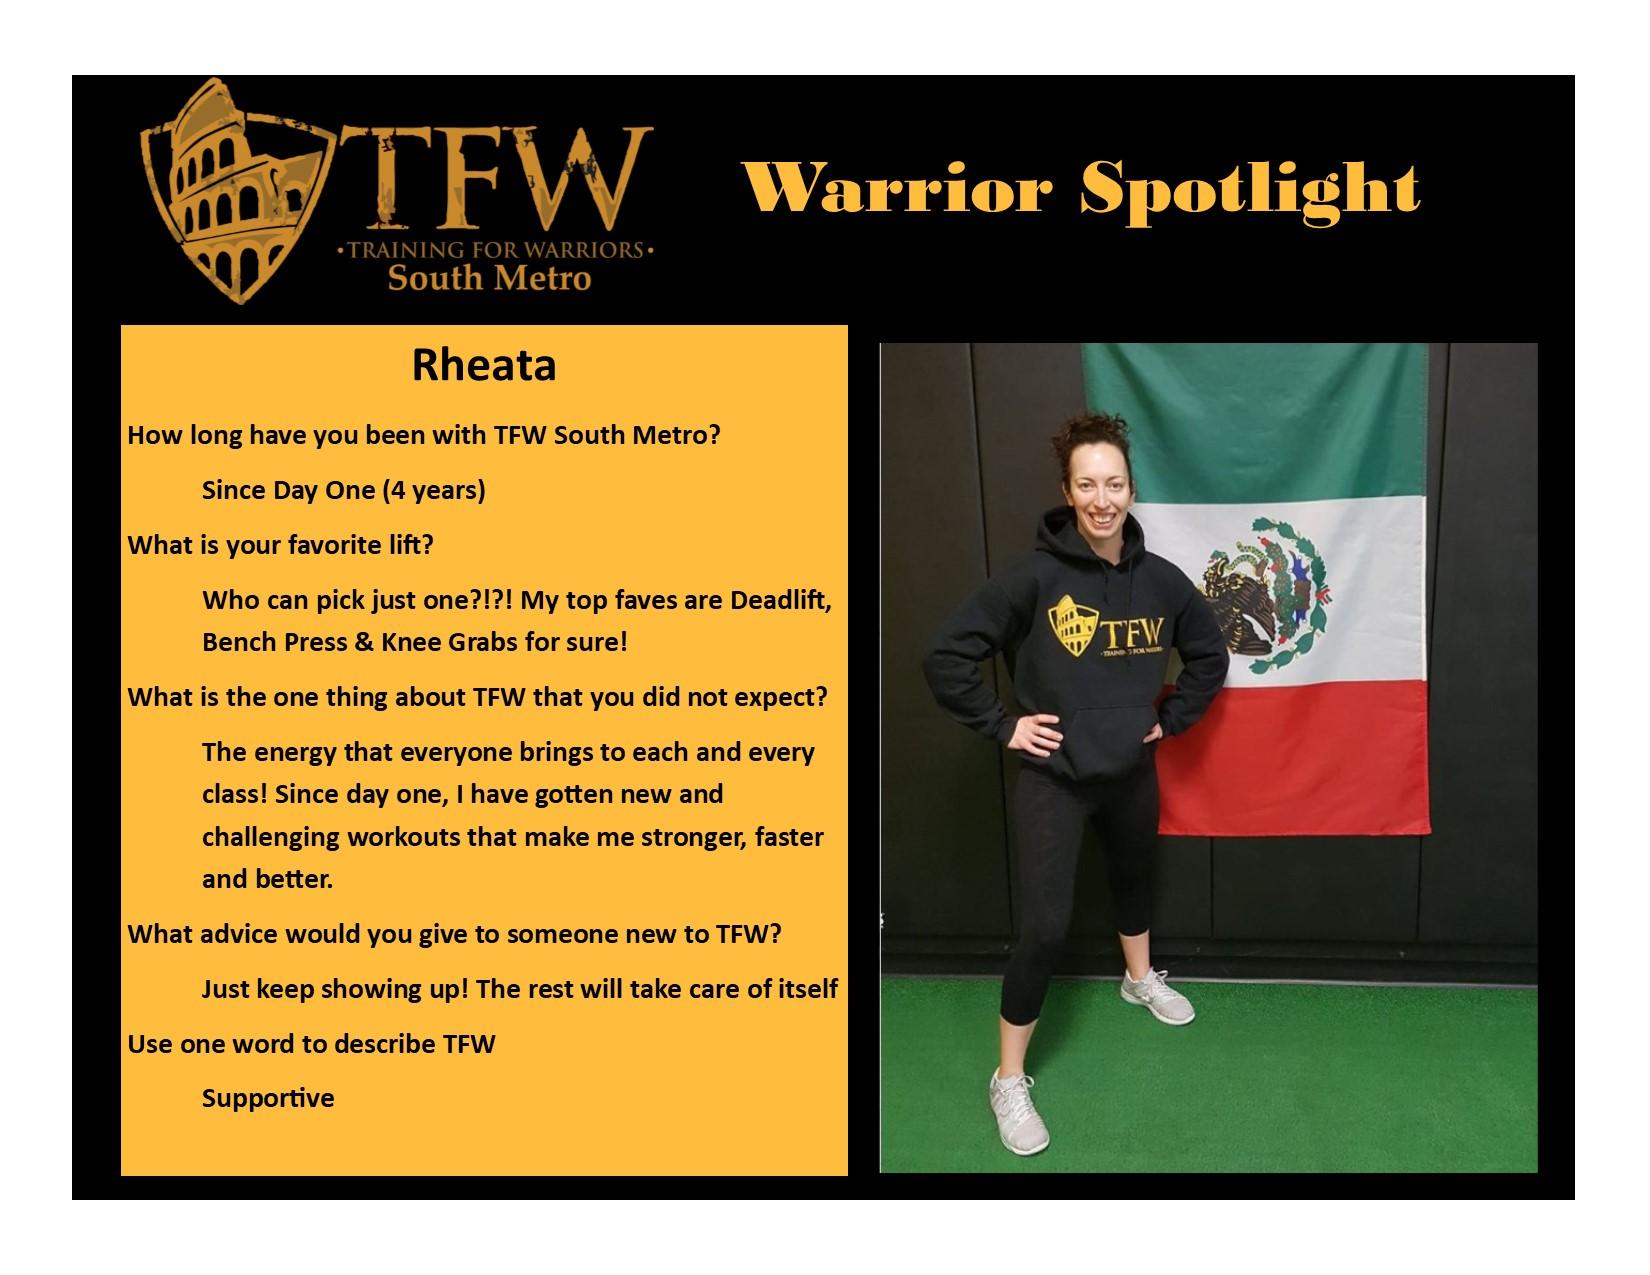 TFW South Metro Warrior, Rheata